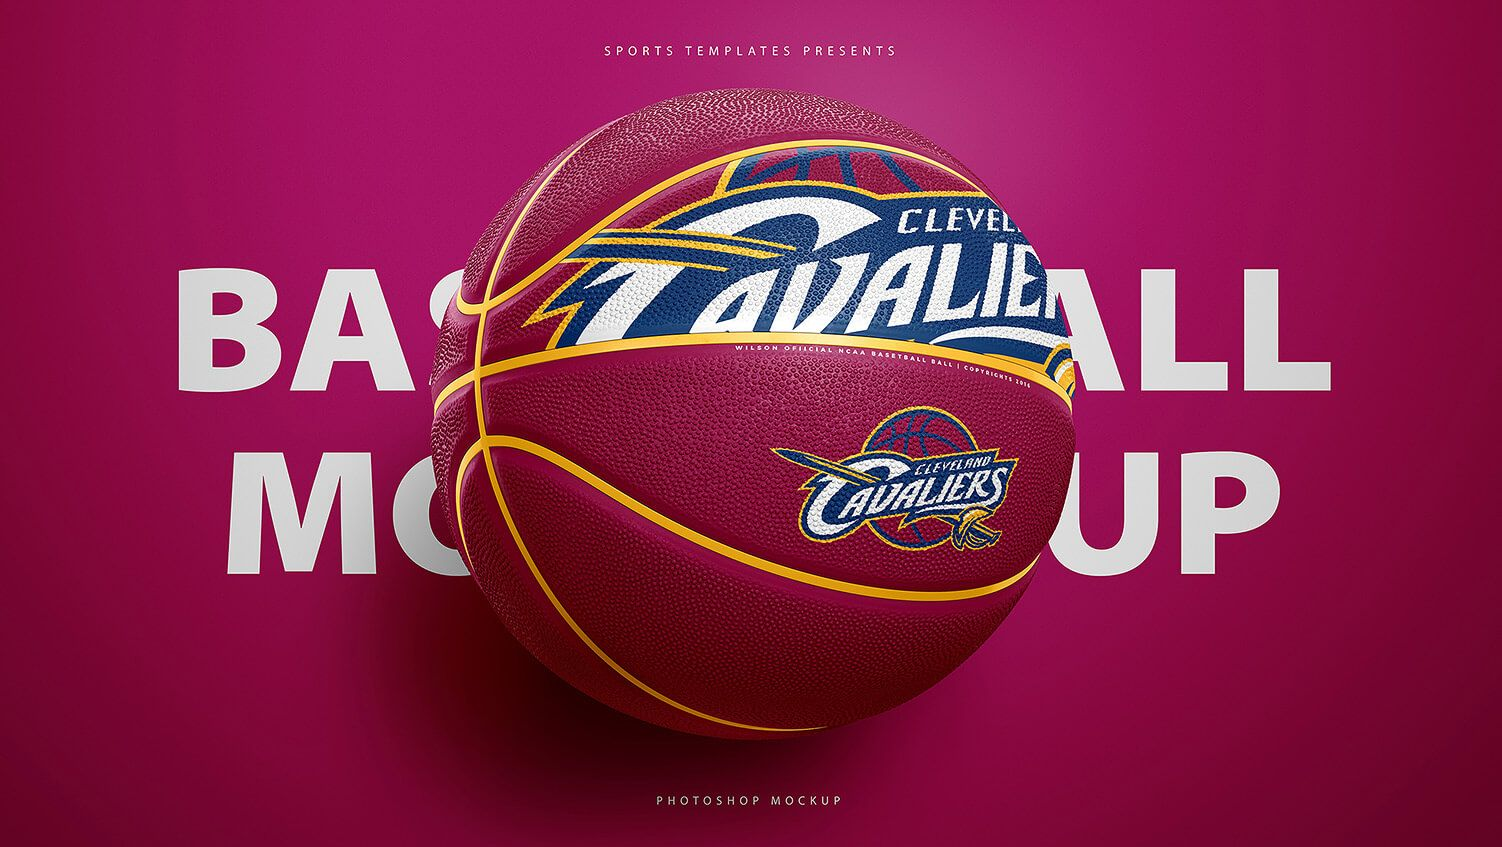 Download Cleveland Cavaliers Basketball Ball Psd Photoshop Mockup Template Basketball Ball Basketball Templates